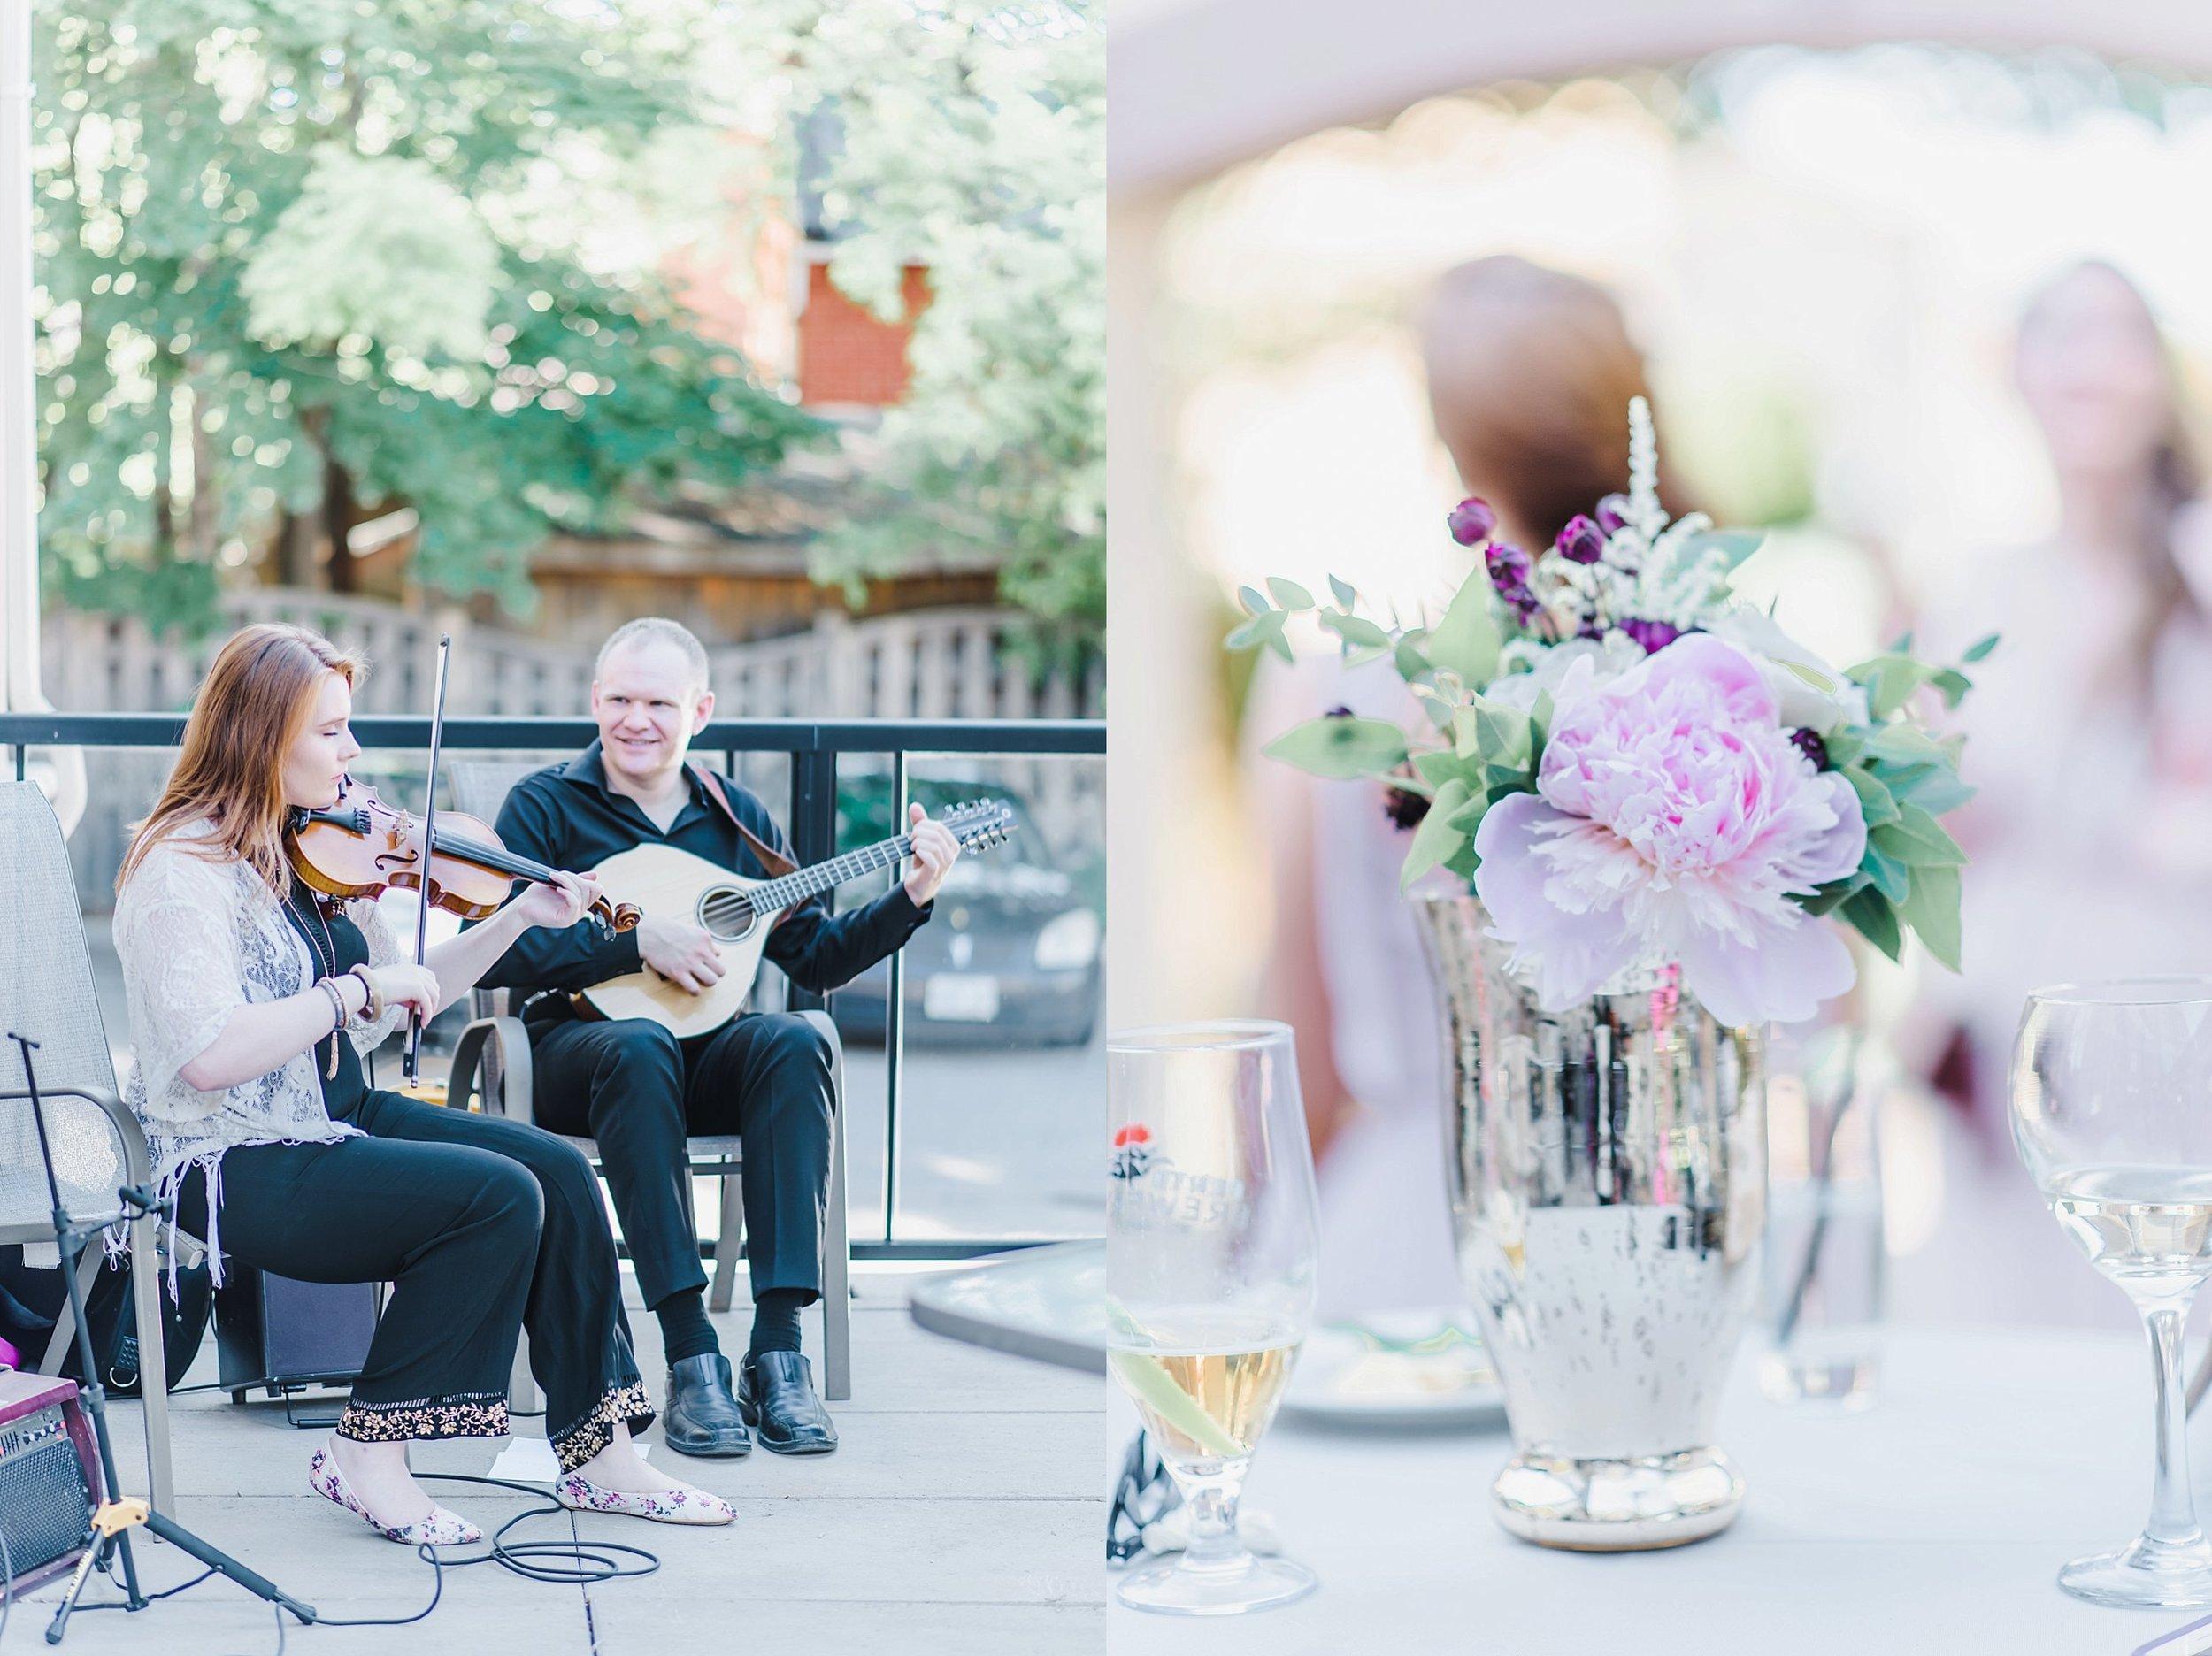 light airy indie fine art ottawa wedding photographer | Ali and Batoul Photography_0093.jpg